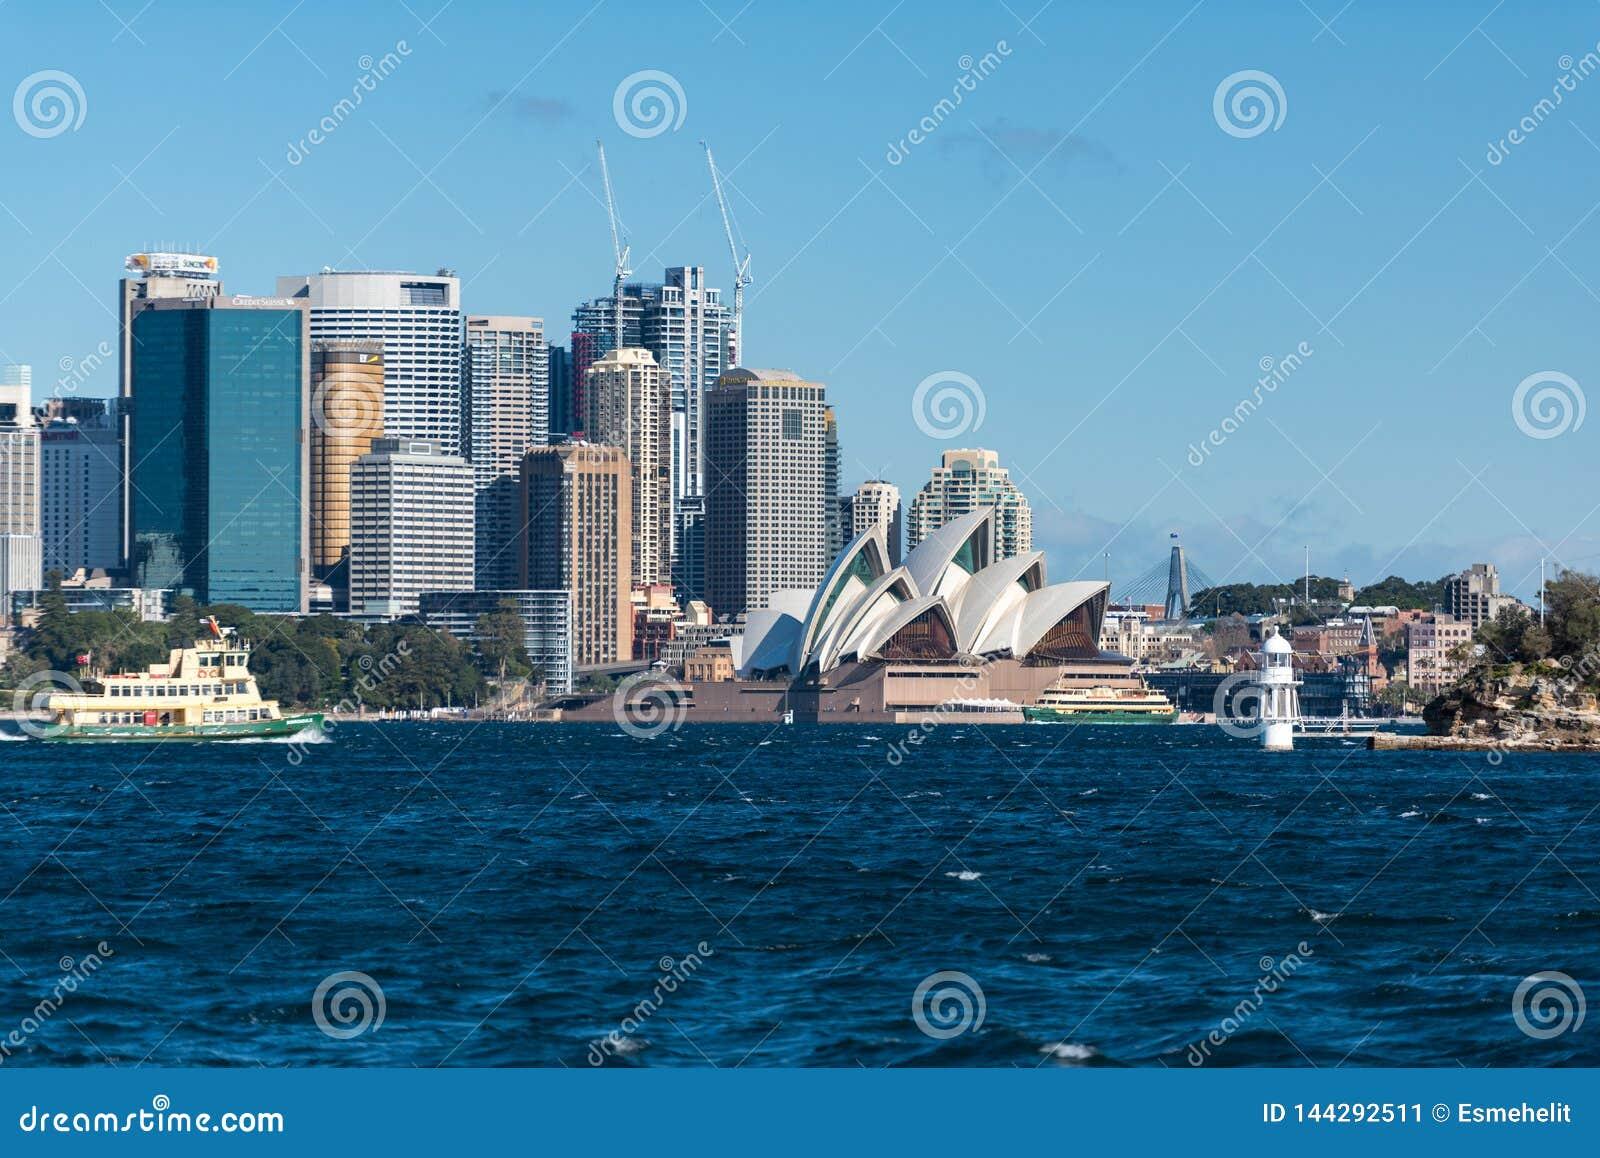 Sydney CBD and Sydney Opera House with ferry boat